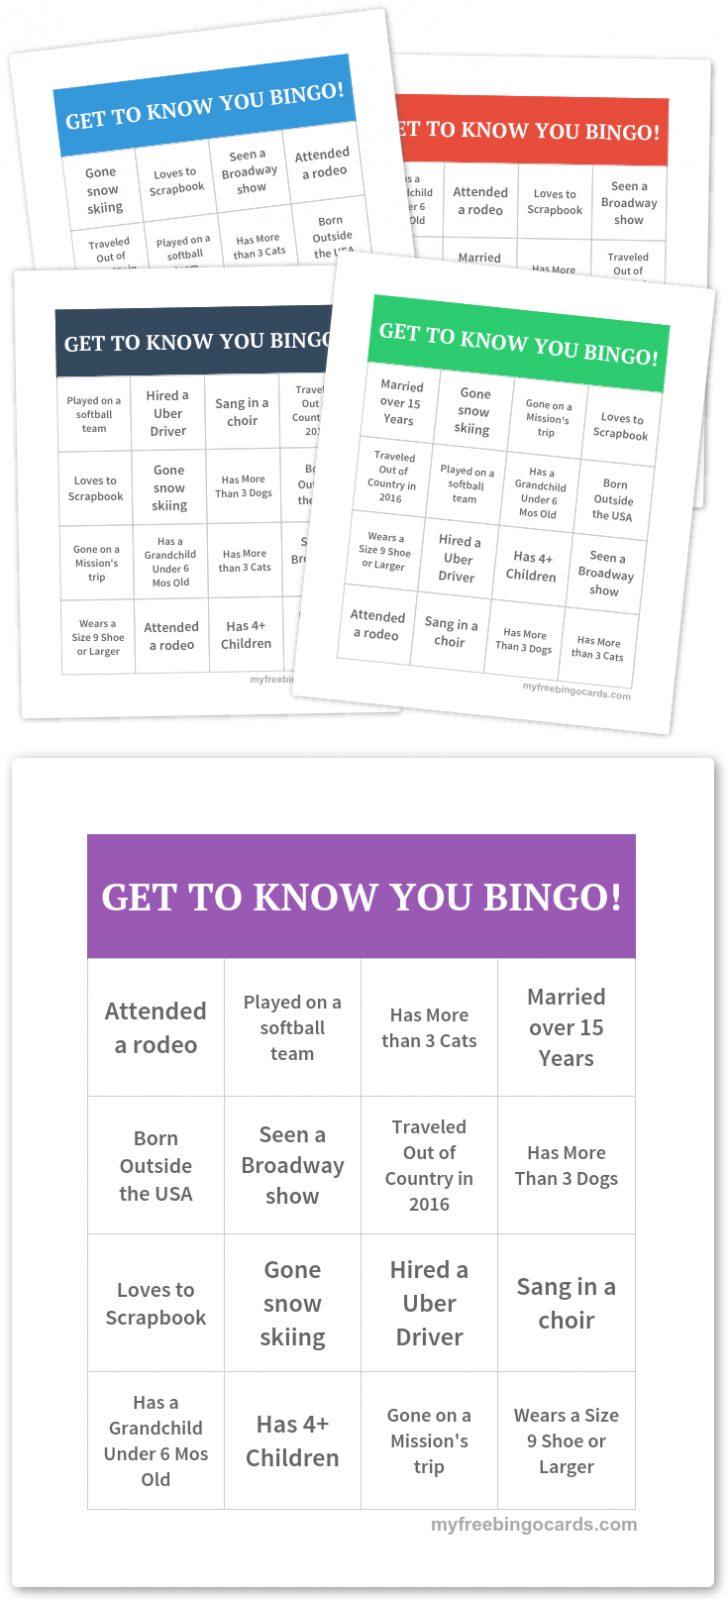 Free Printable Get To Know You Bingo Cards